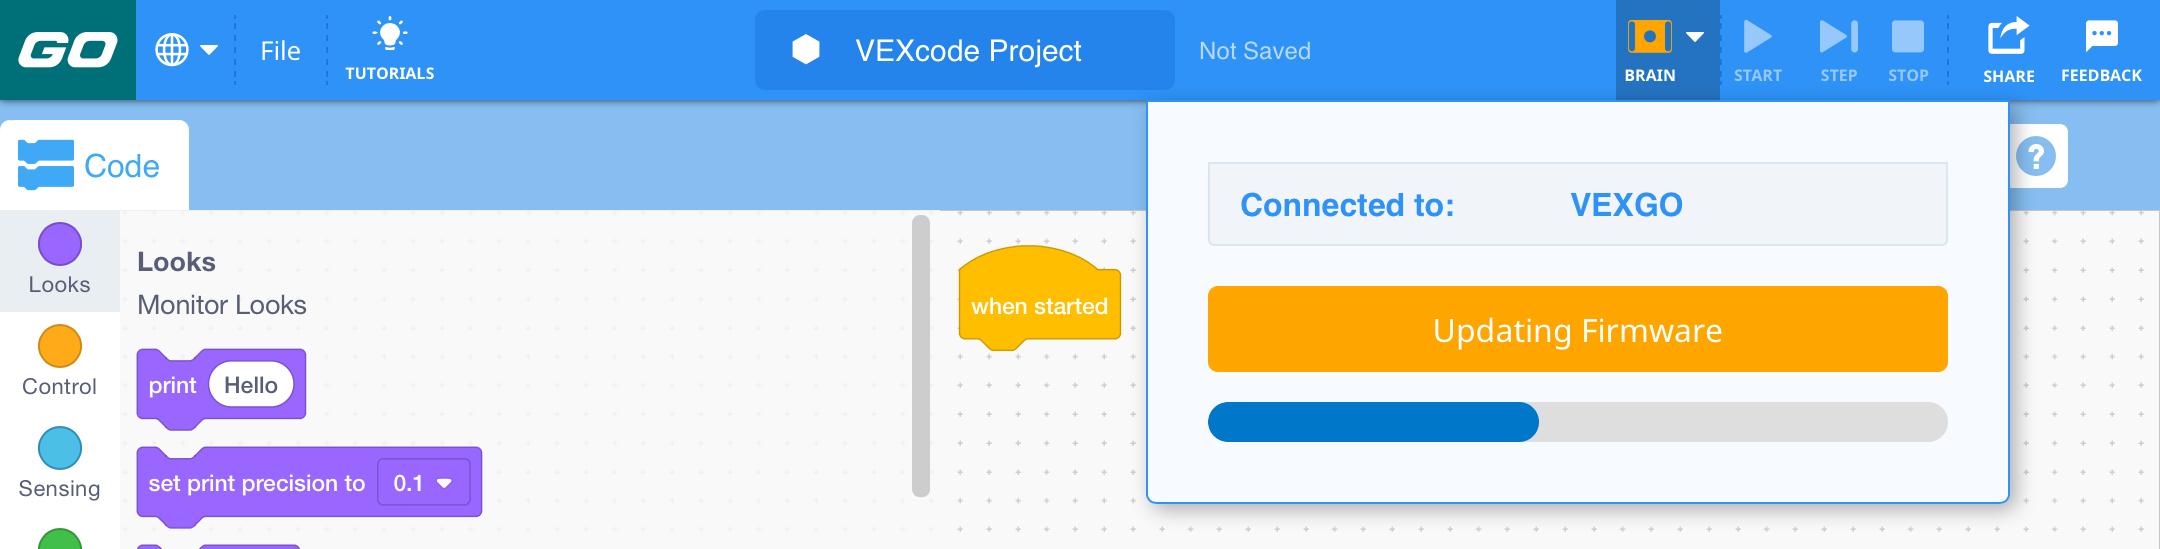 Update_firmware_VEXcode_GO.jpeg